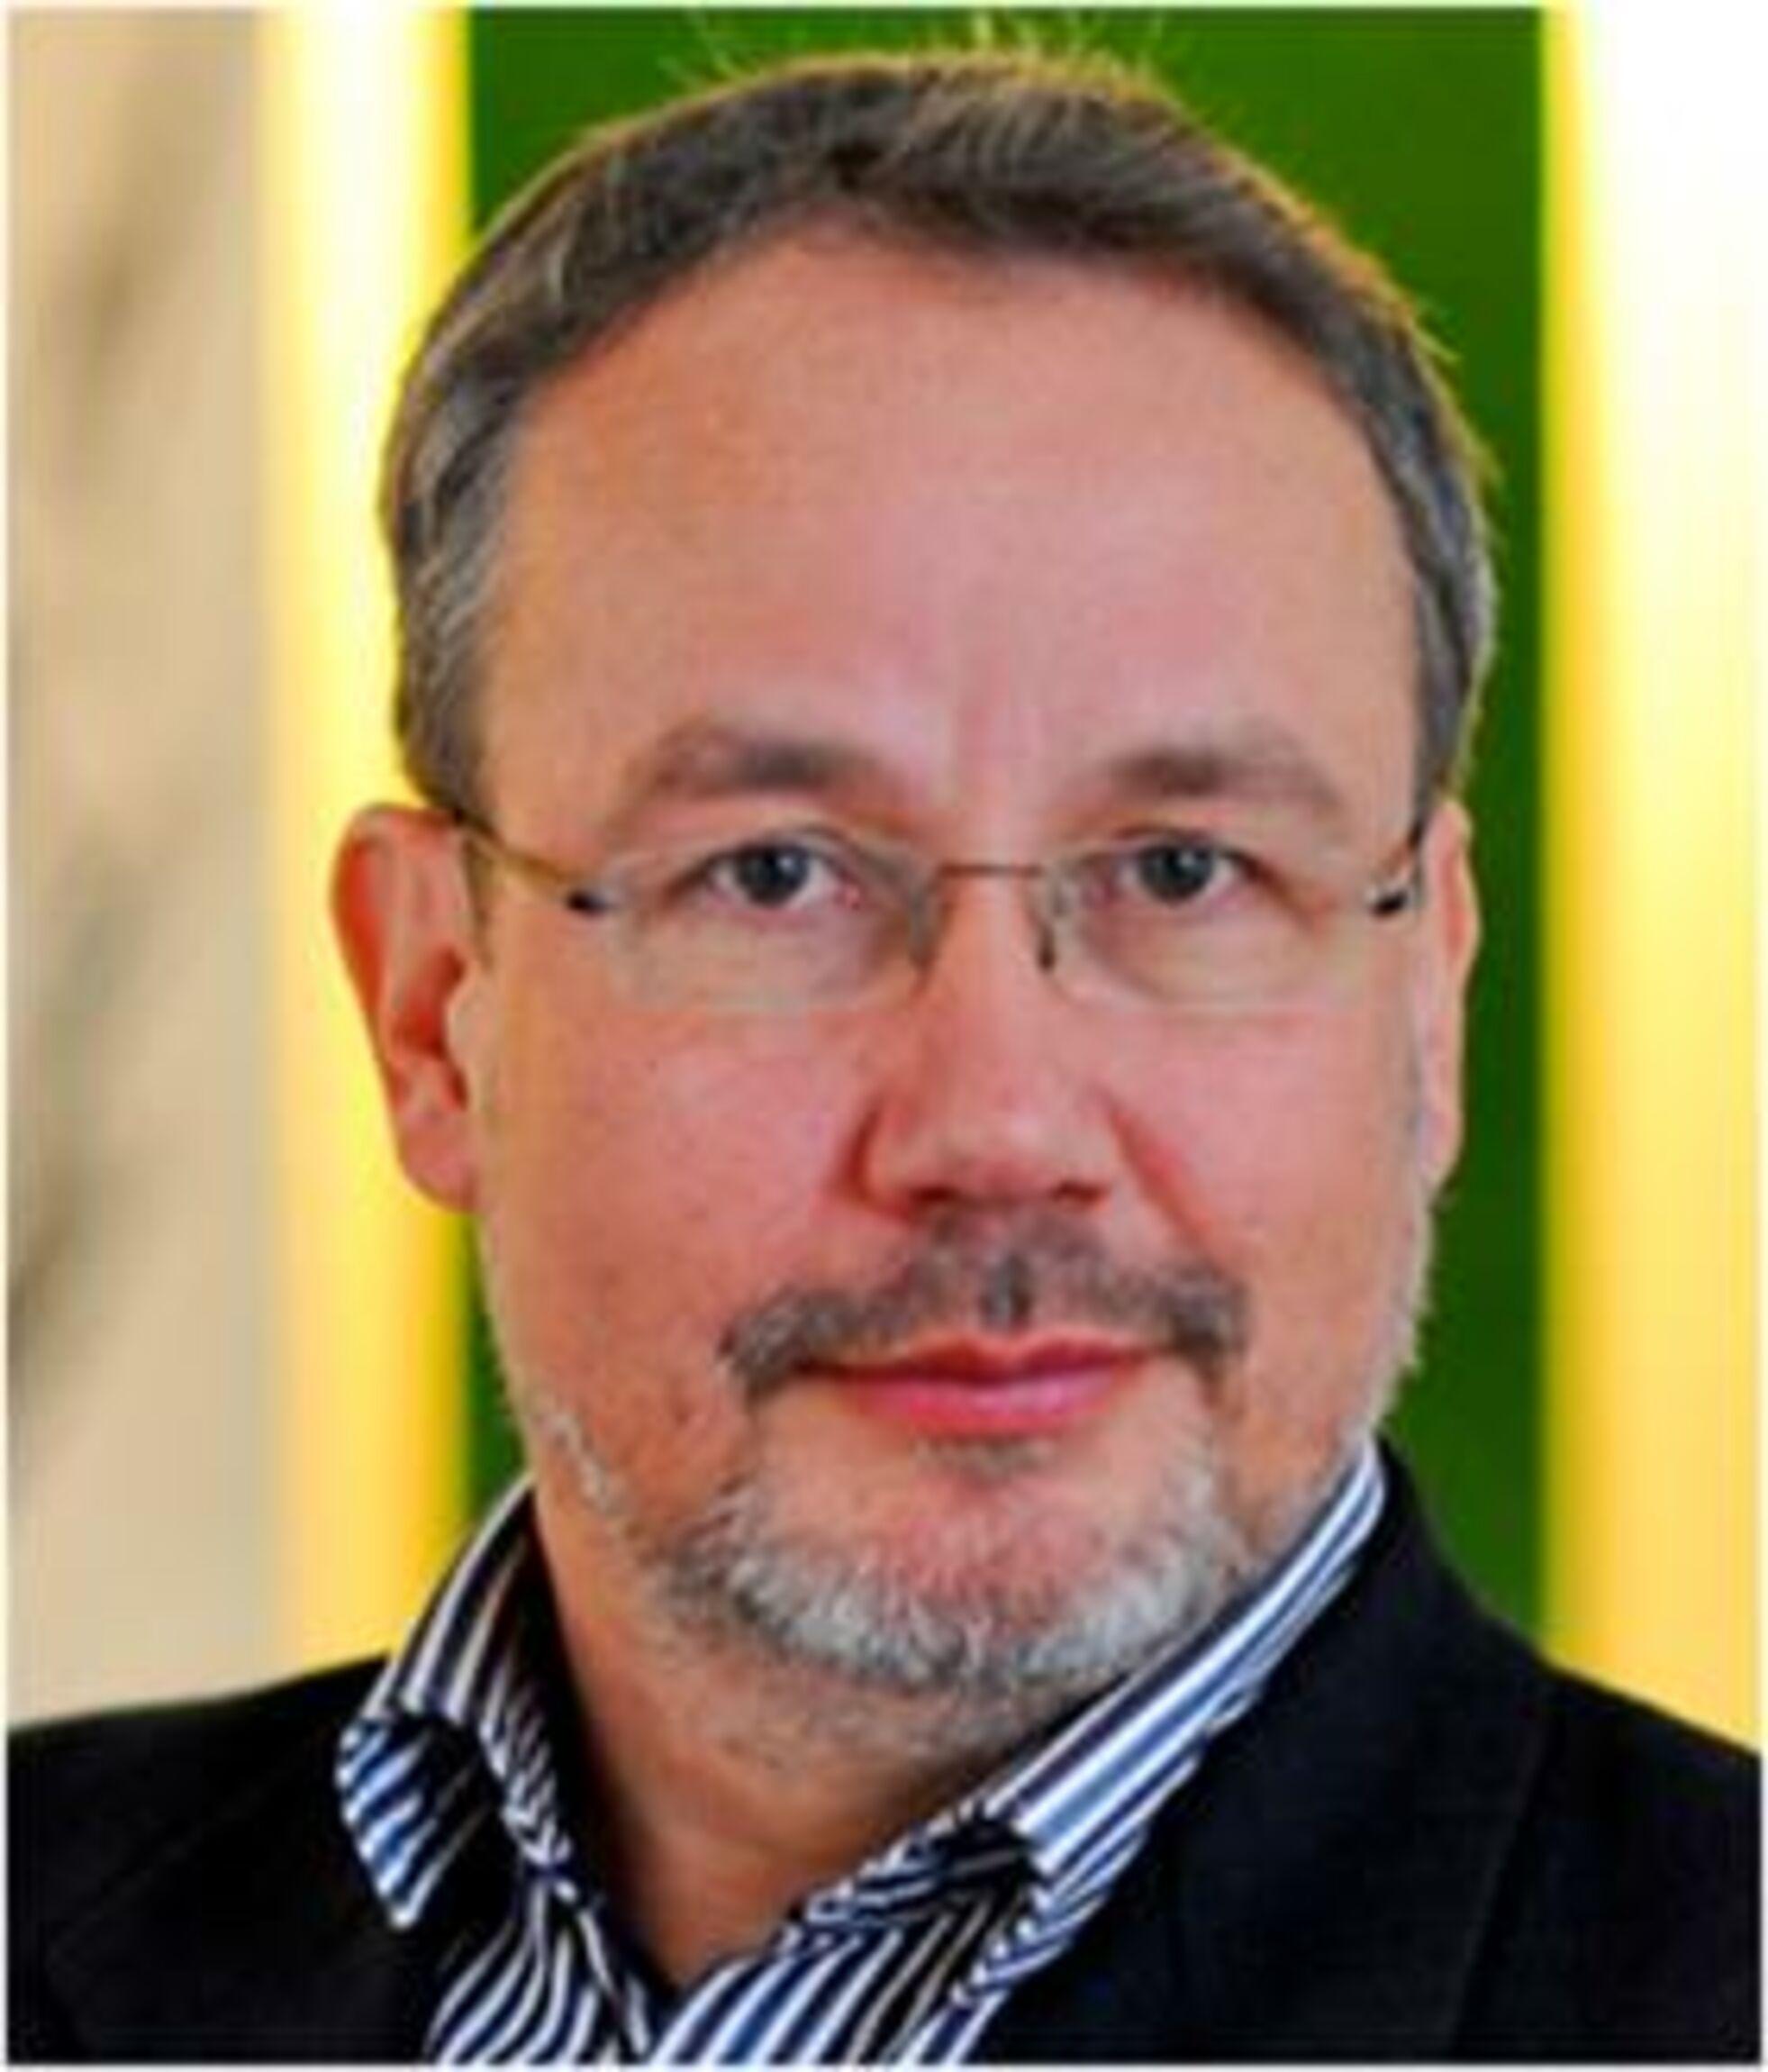 Pastor Johann-Hinrich Witzel